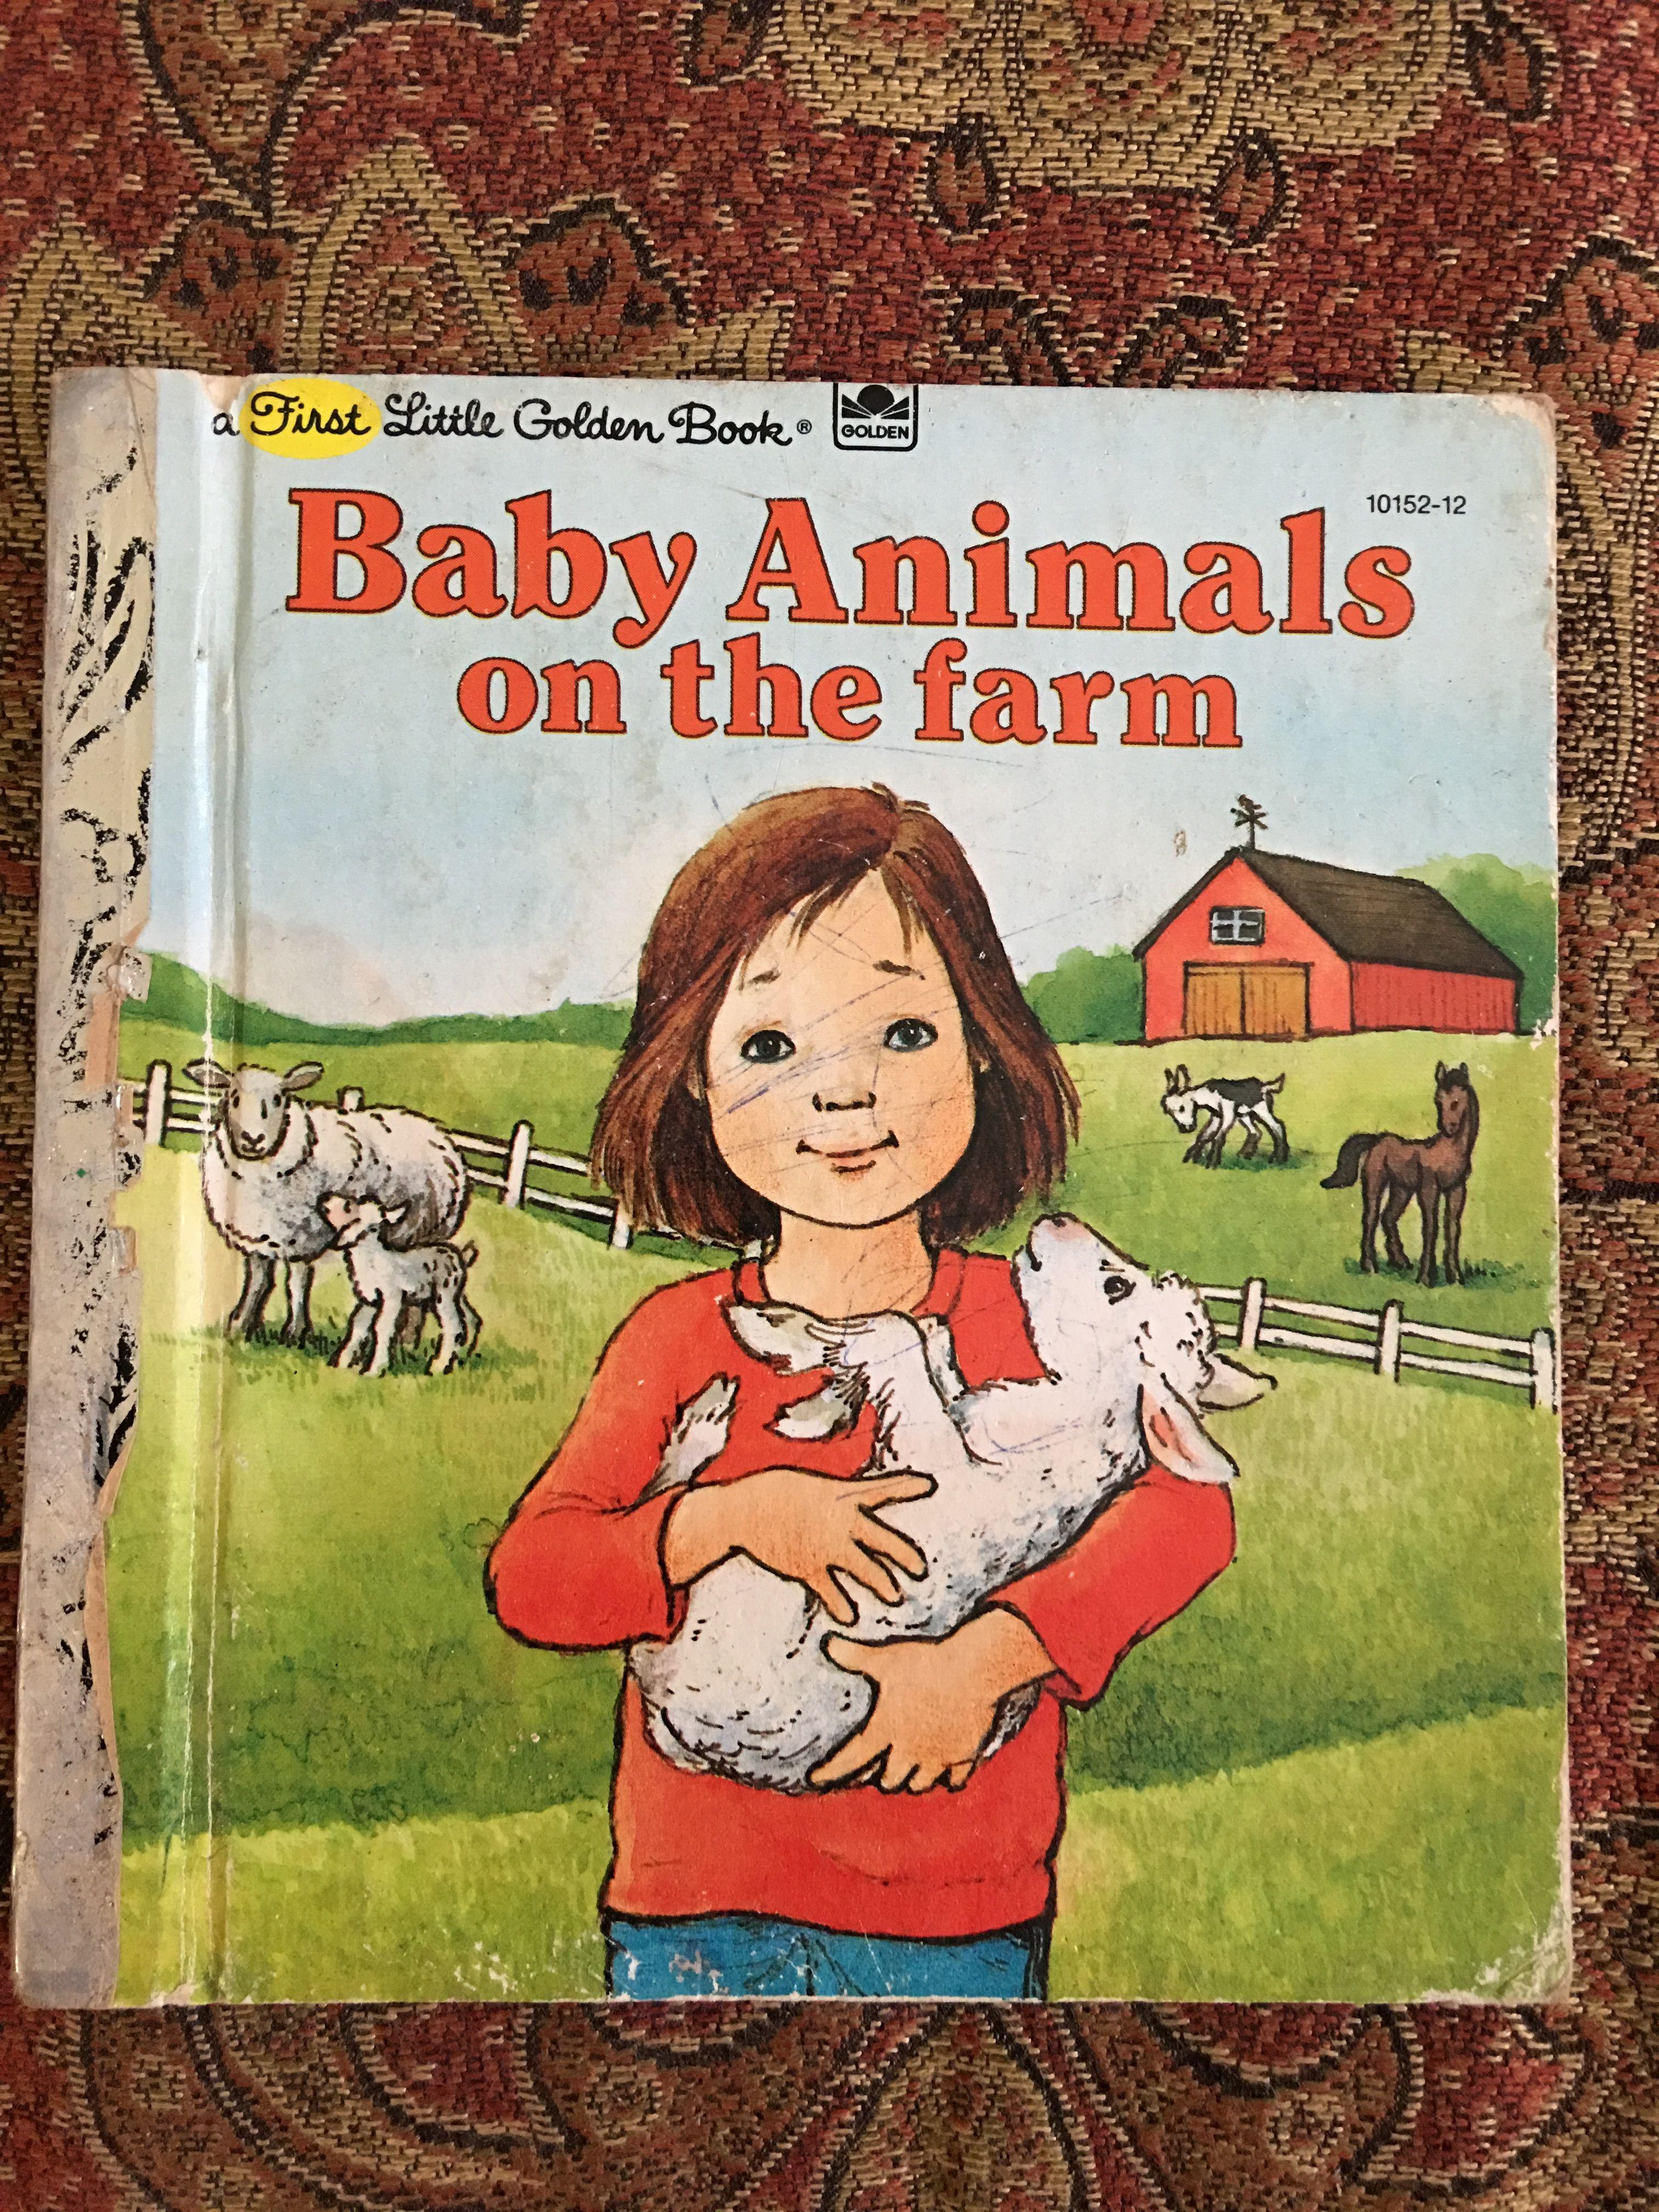 Baby animals on the farm 1981 little golden books farm